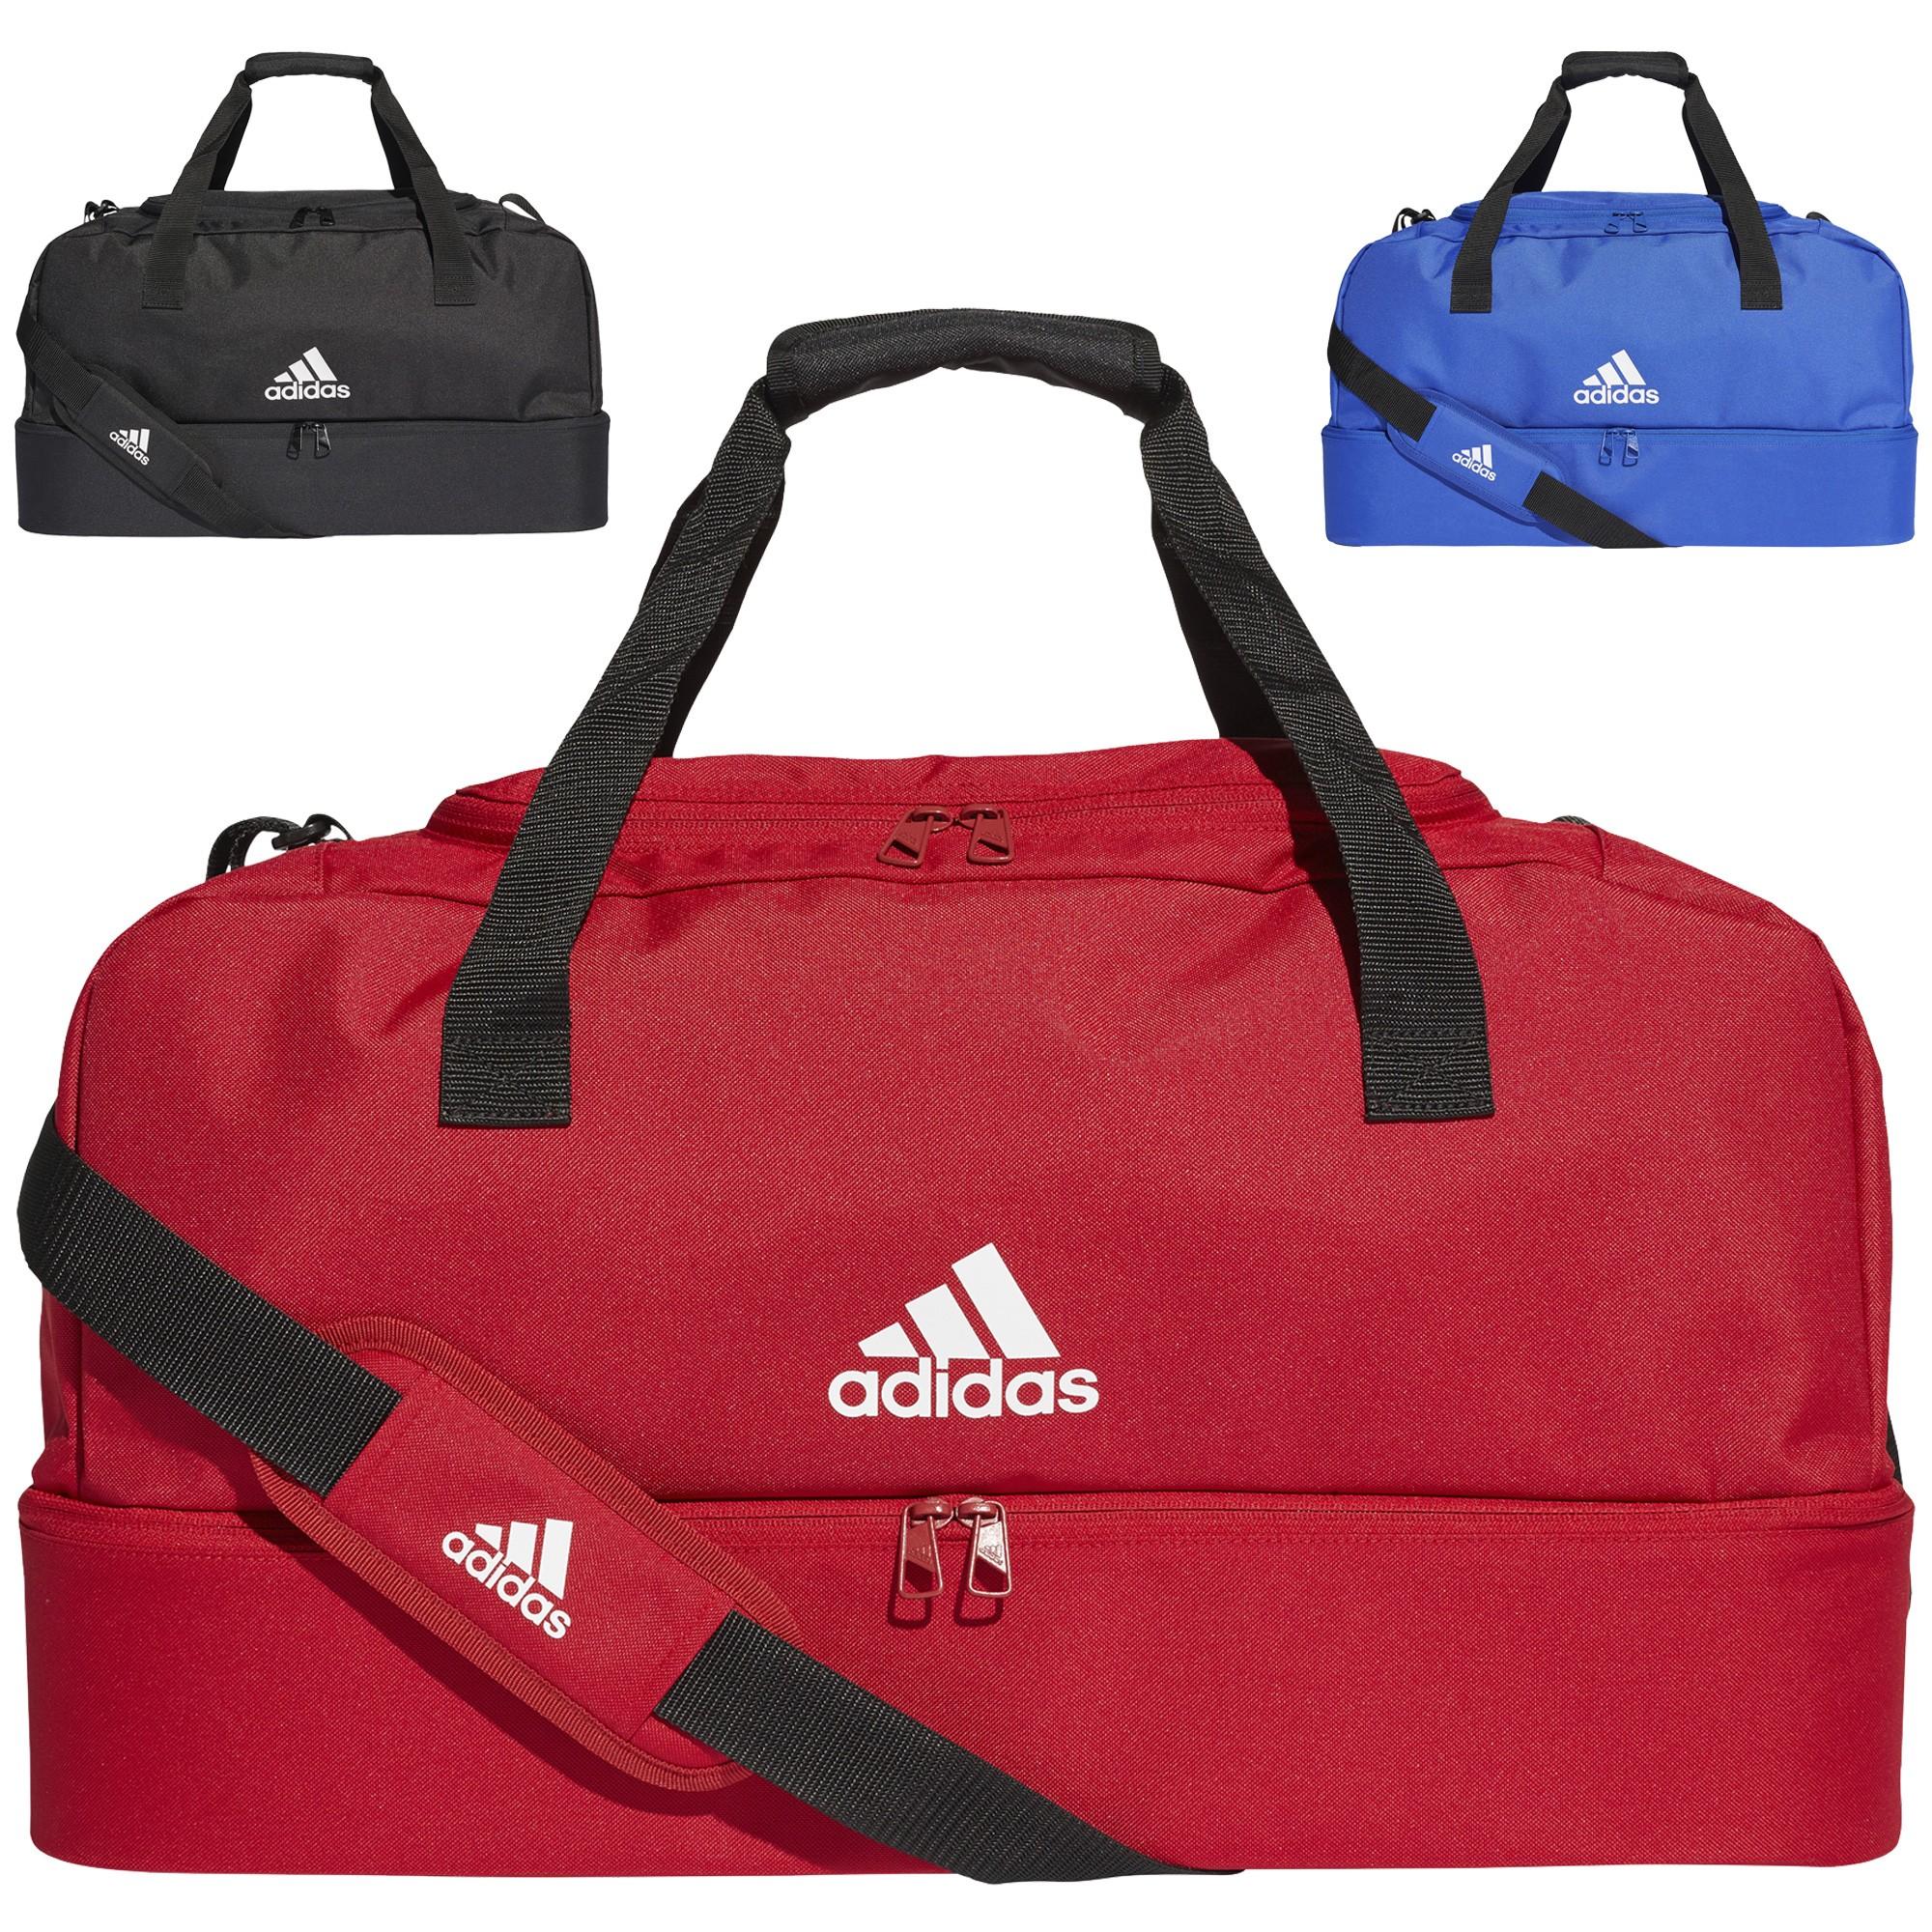 8d87f9baba Sac de sport Adidas Tiro Dufflebag avec compartiment inferieur M ...